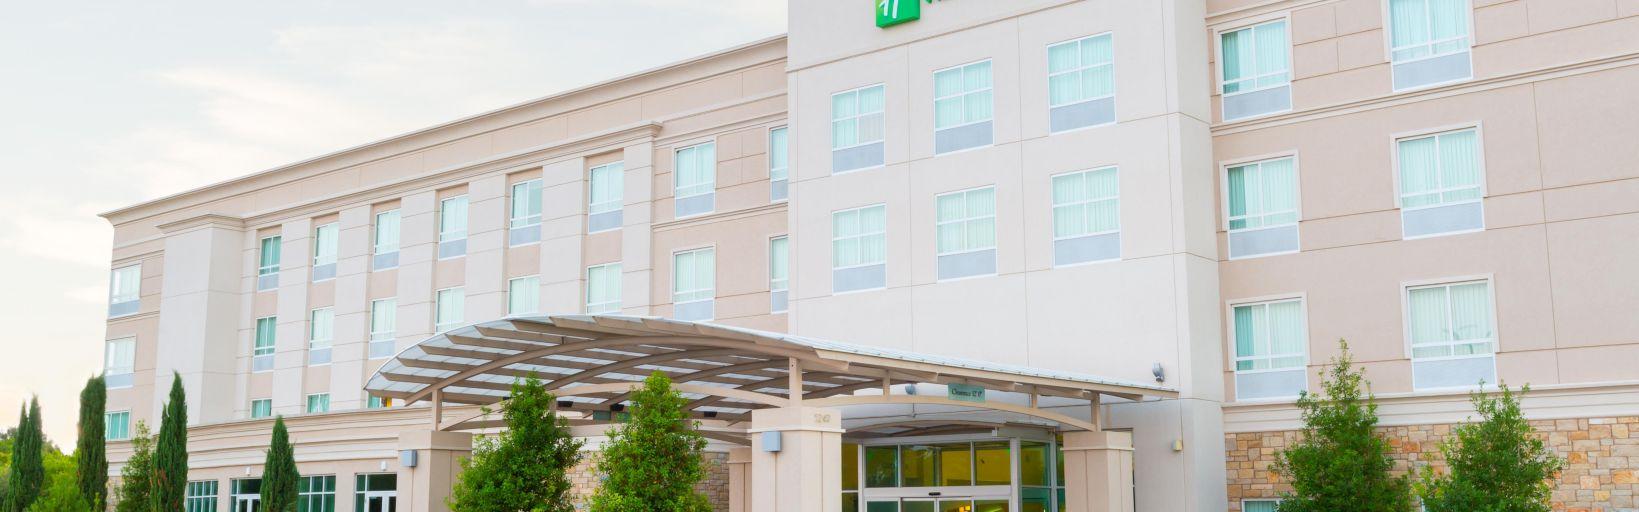 Holiday Inn Temple-Belton Hotel by IHG